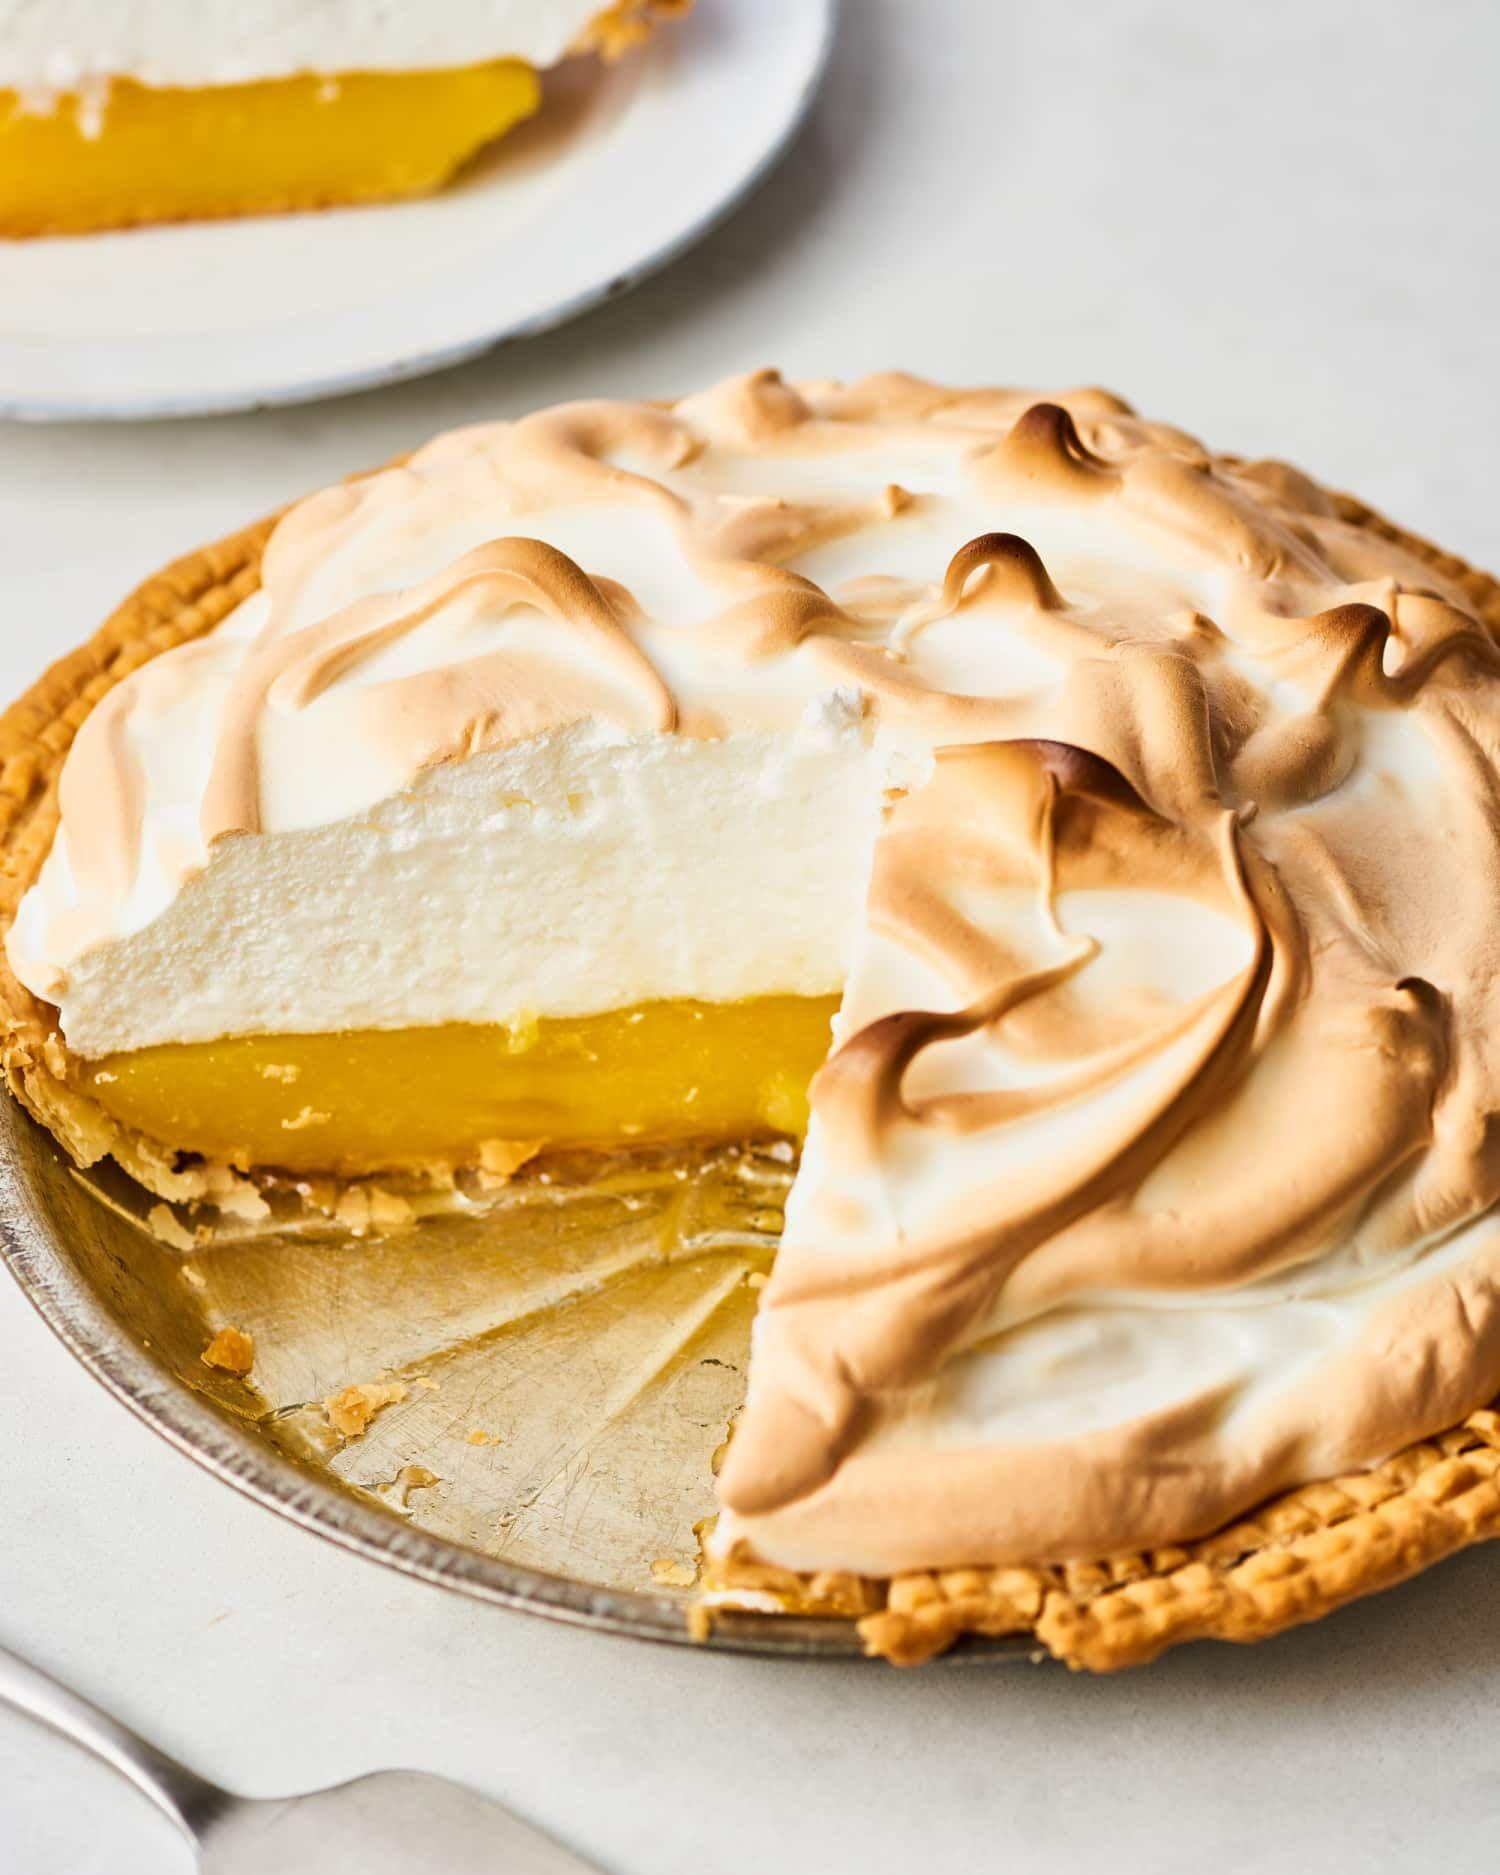 How To Make Lemon Meringue Pie Recipe Meringue Pie Recipes Lemon Meringue Pie Lemon Meringue